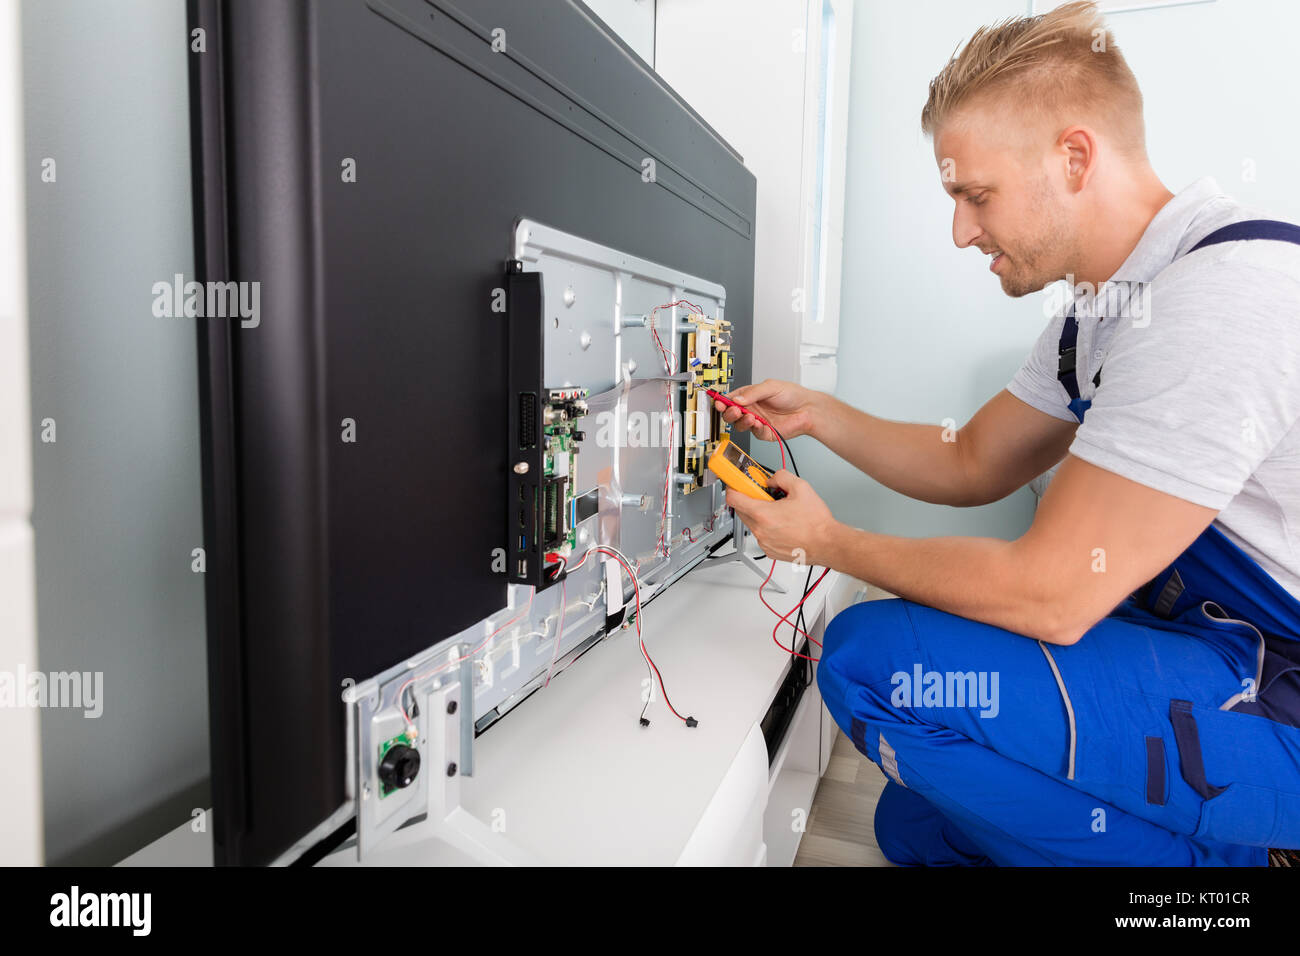 Elektriker prüfen Fernsehen Stockbild